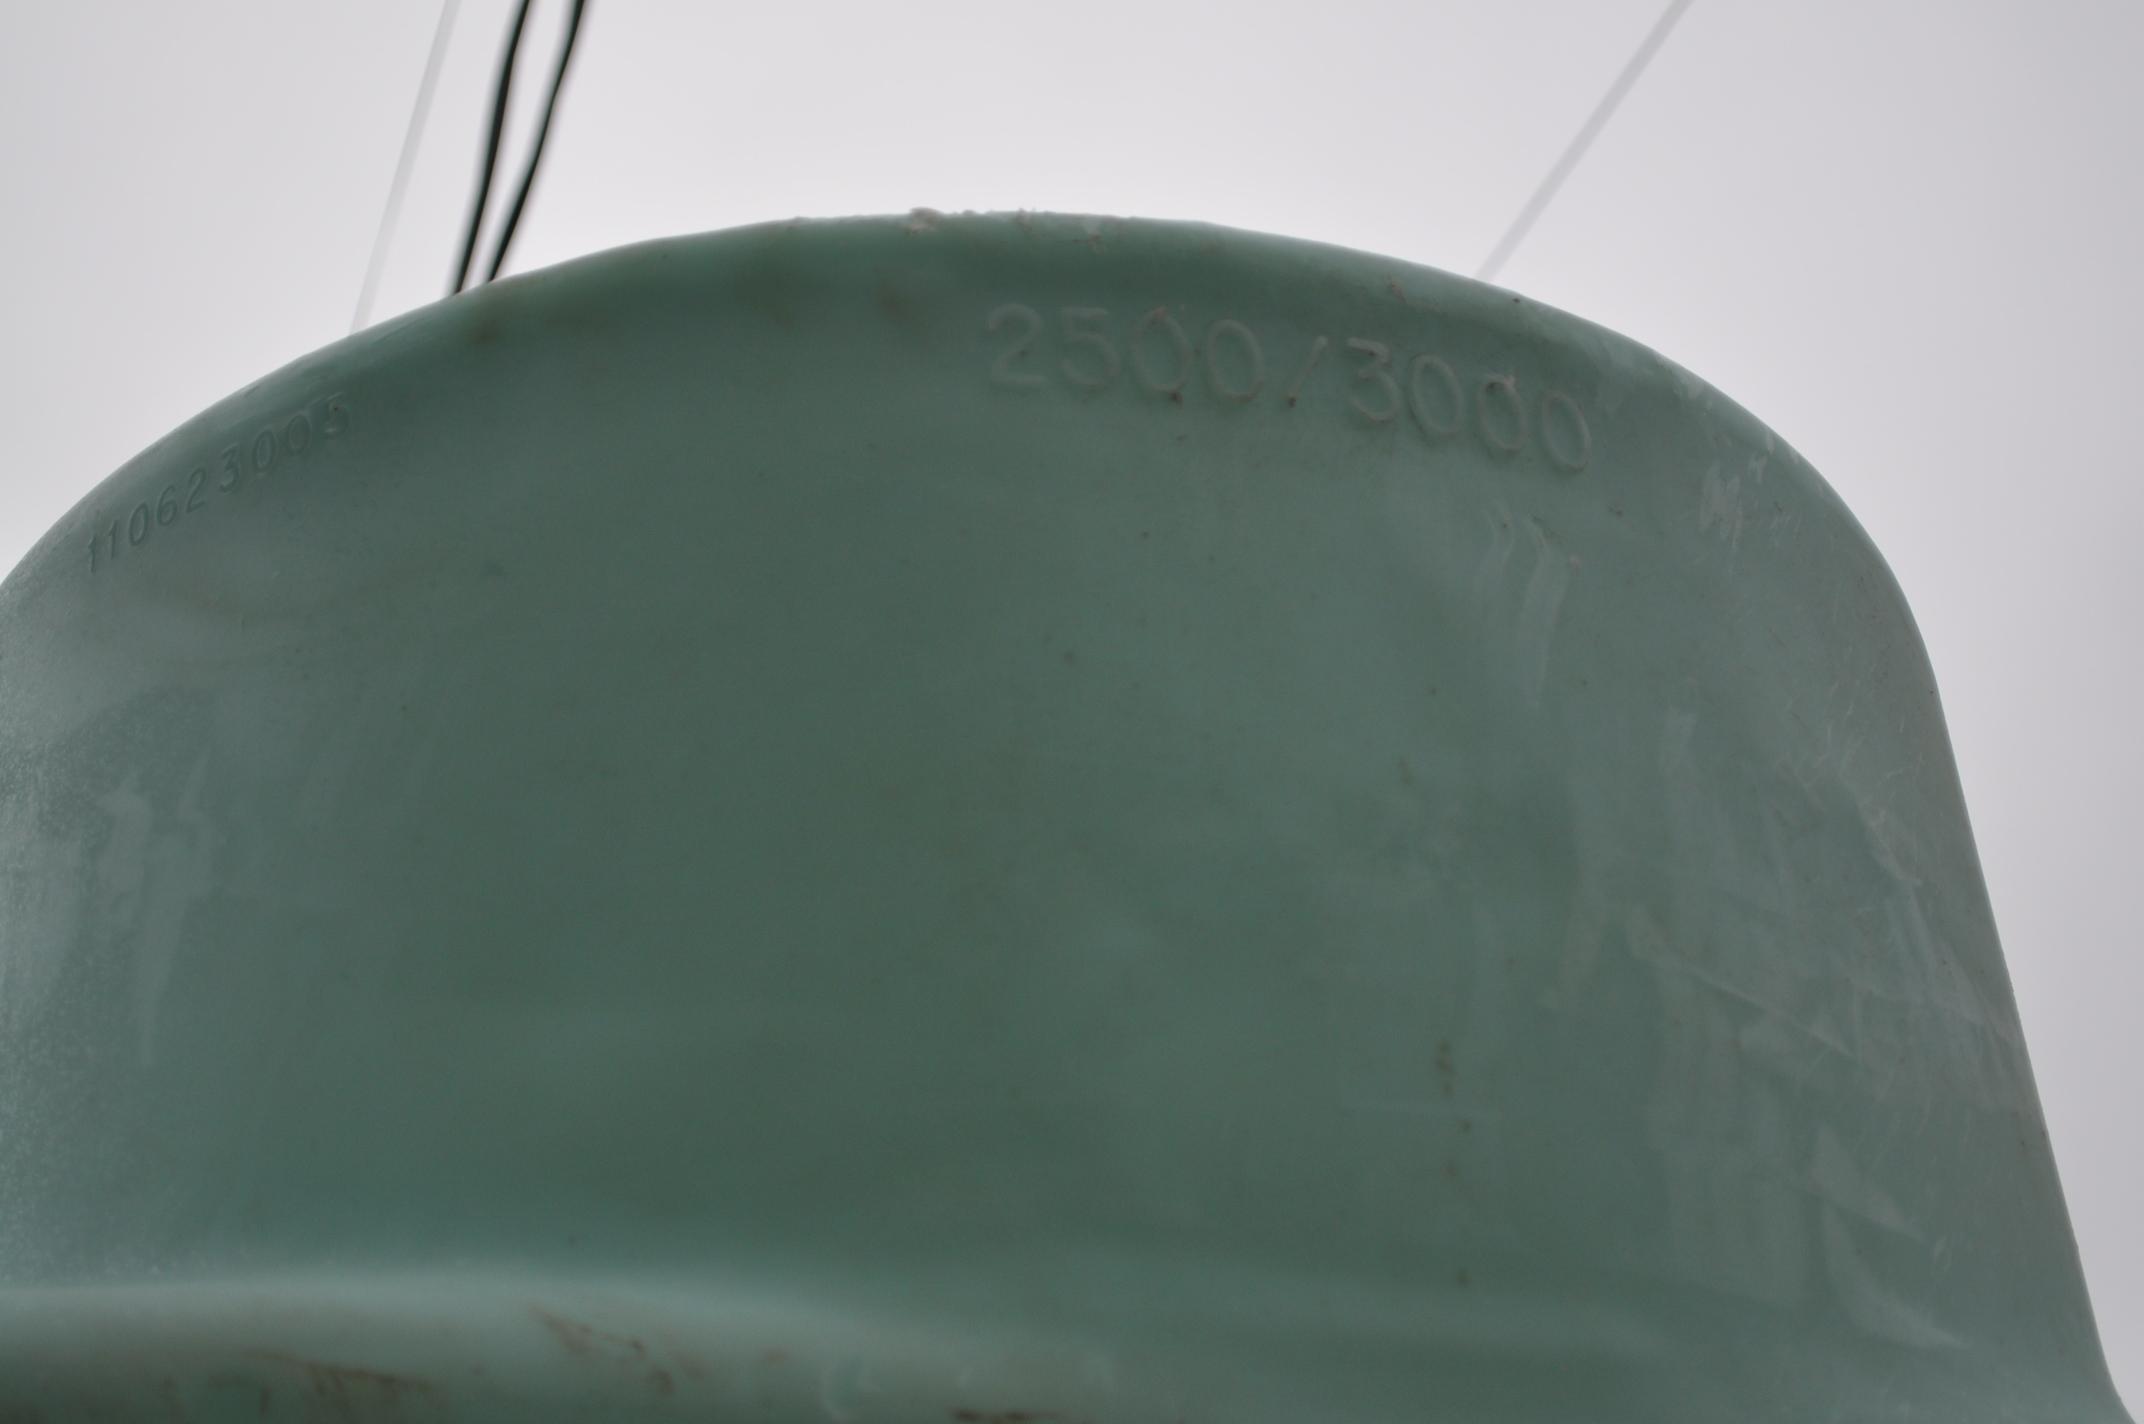 3000 gal poly flat bottom tank, always in barn - Image 4 of 4